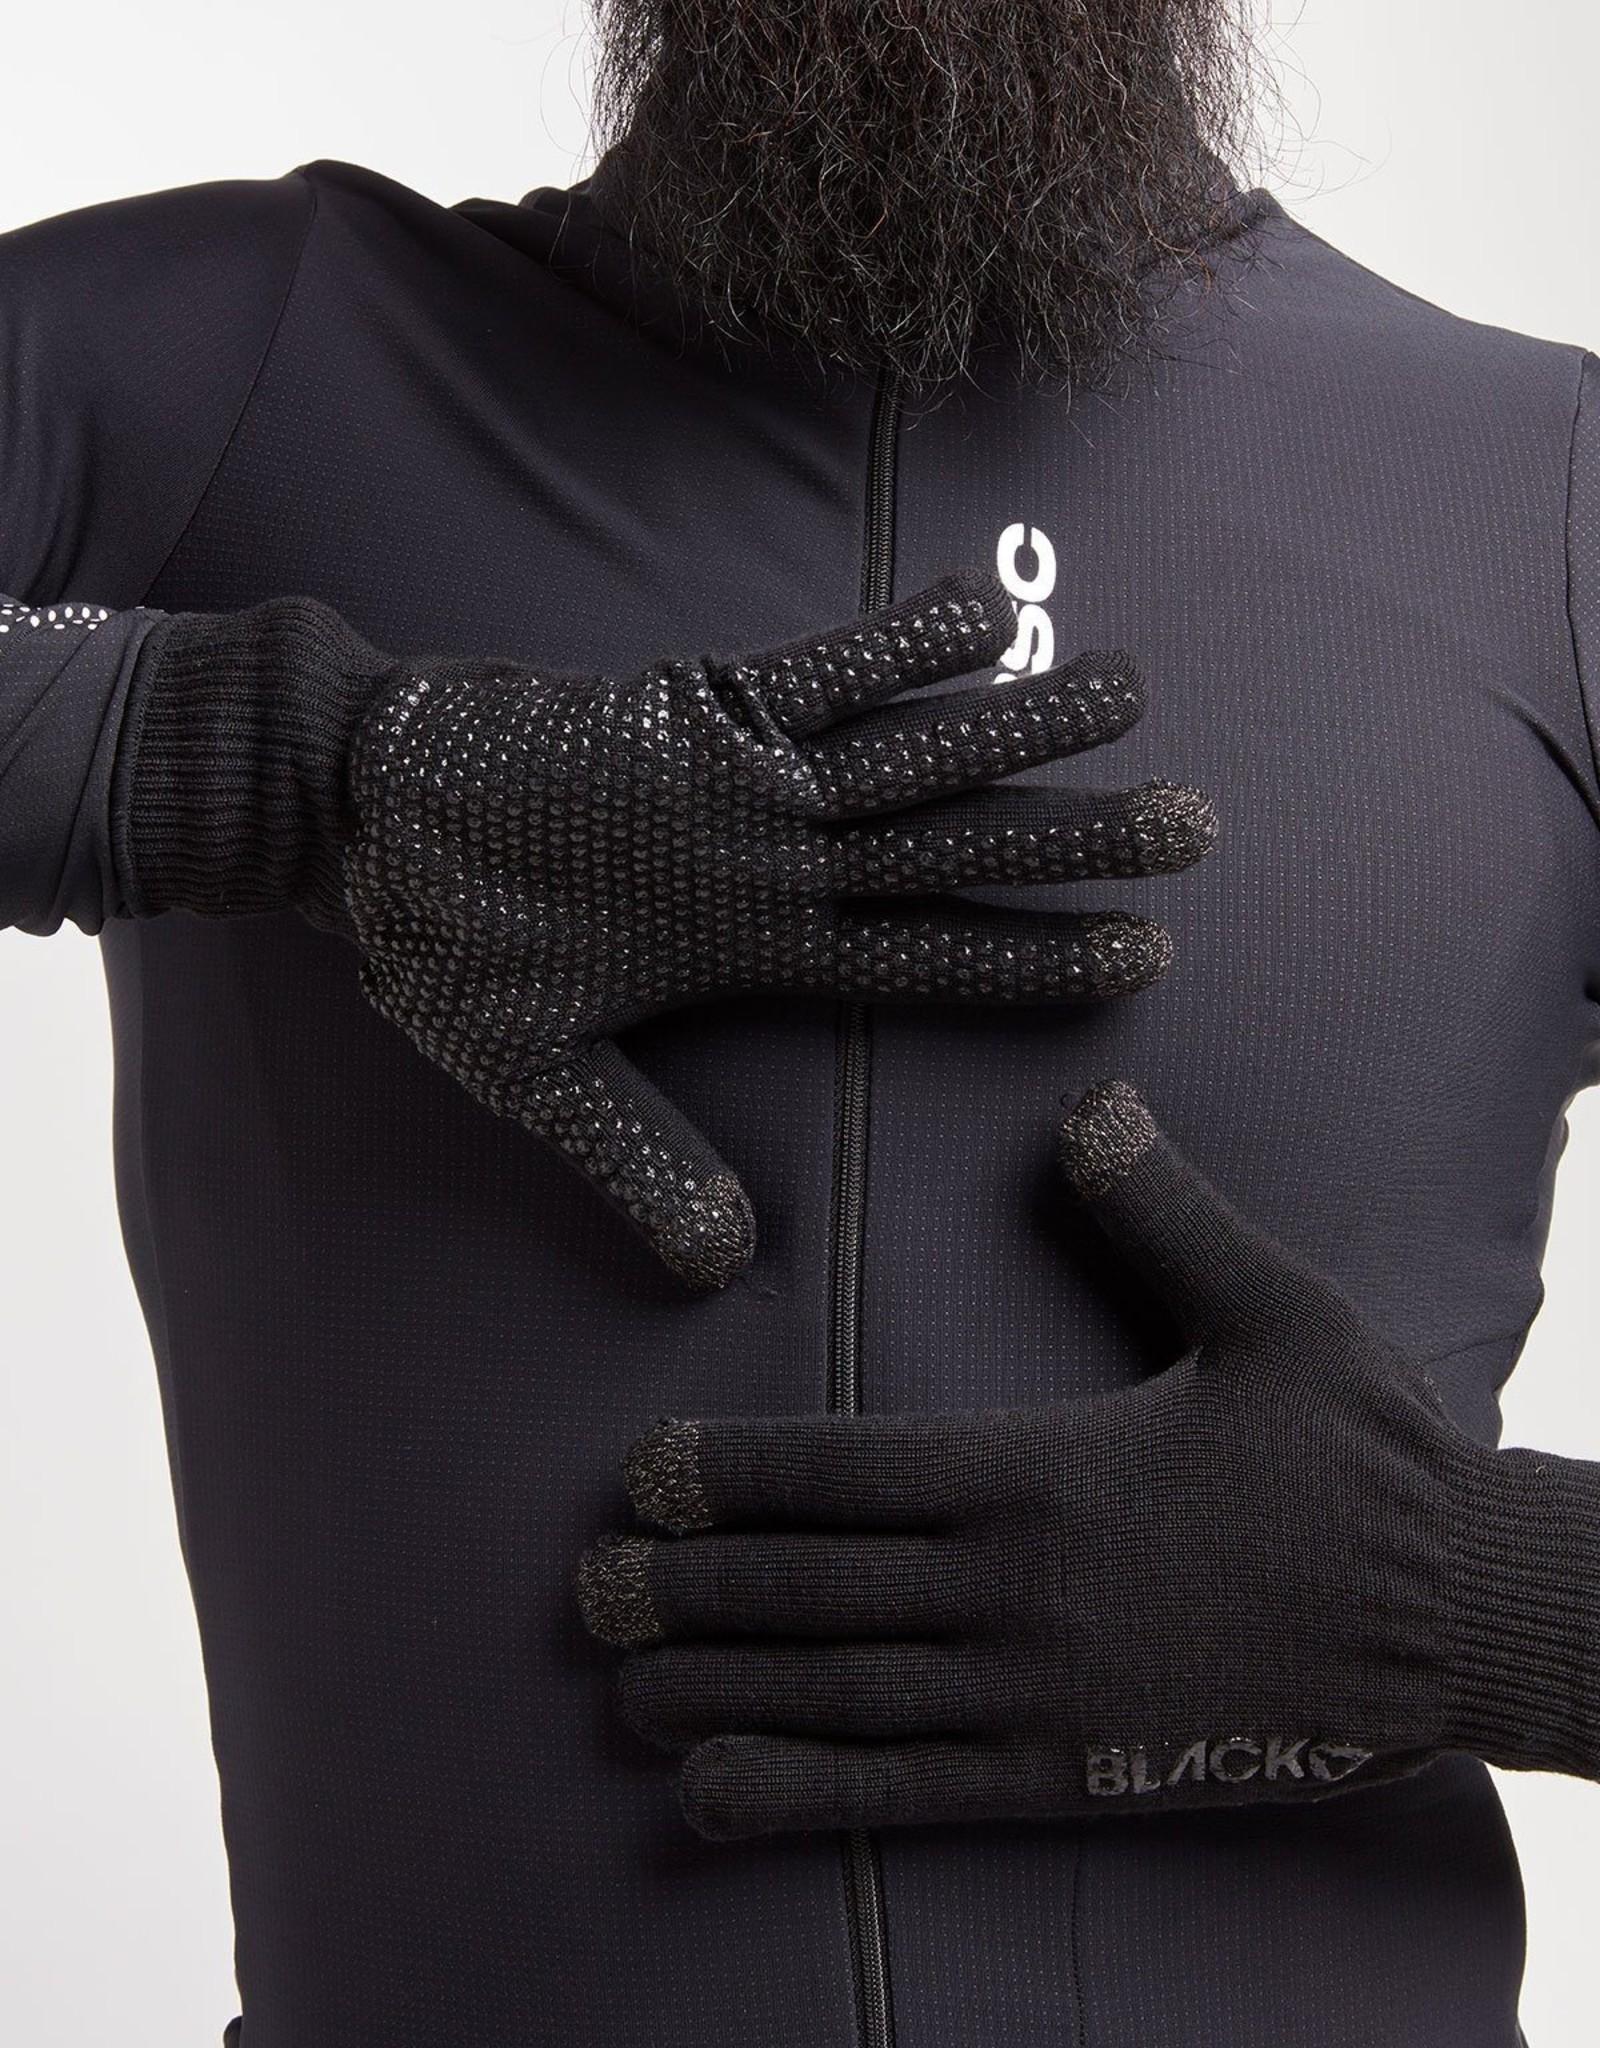 Black Sheep Cycling Elements Merino Cycling Gloves